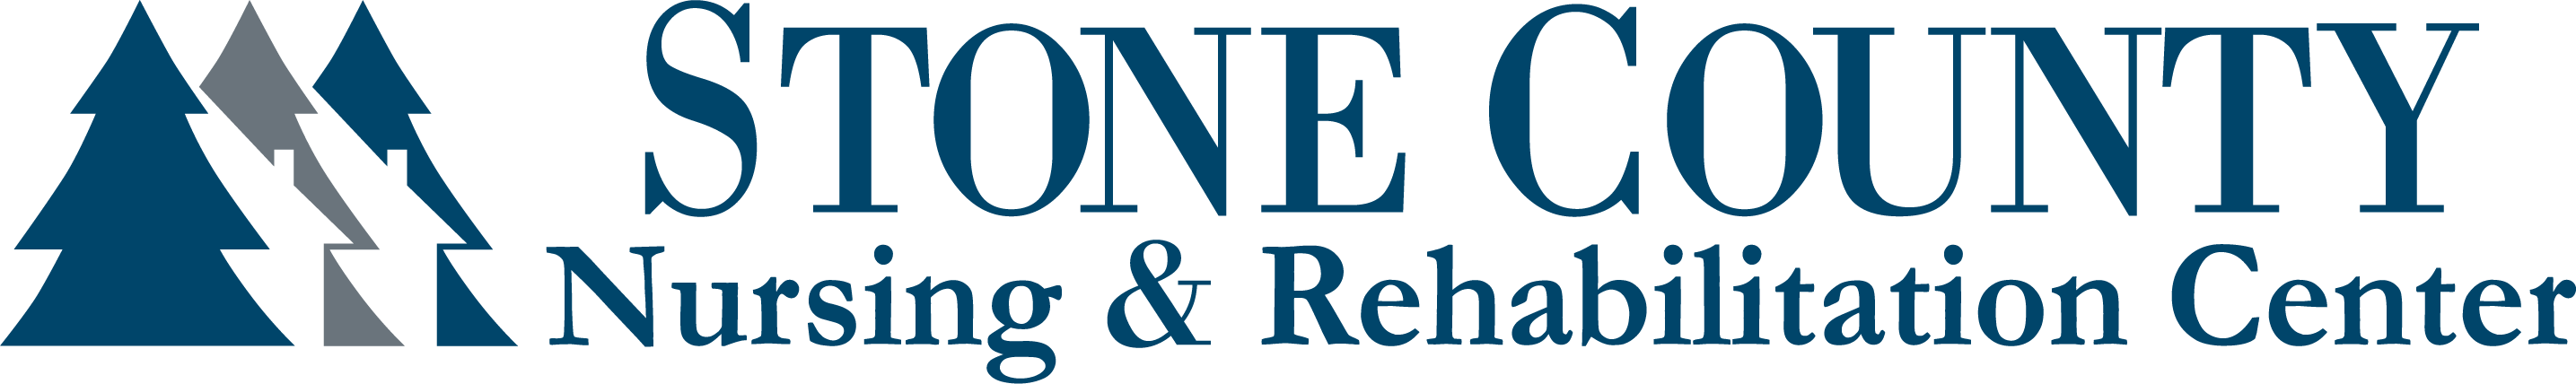 Stone County Nursing and Rehabilitation